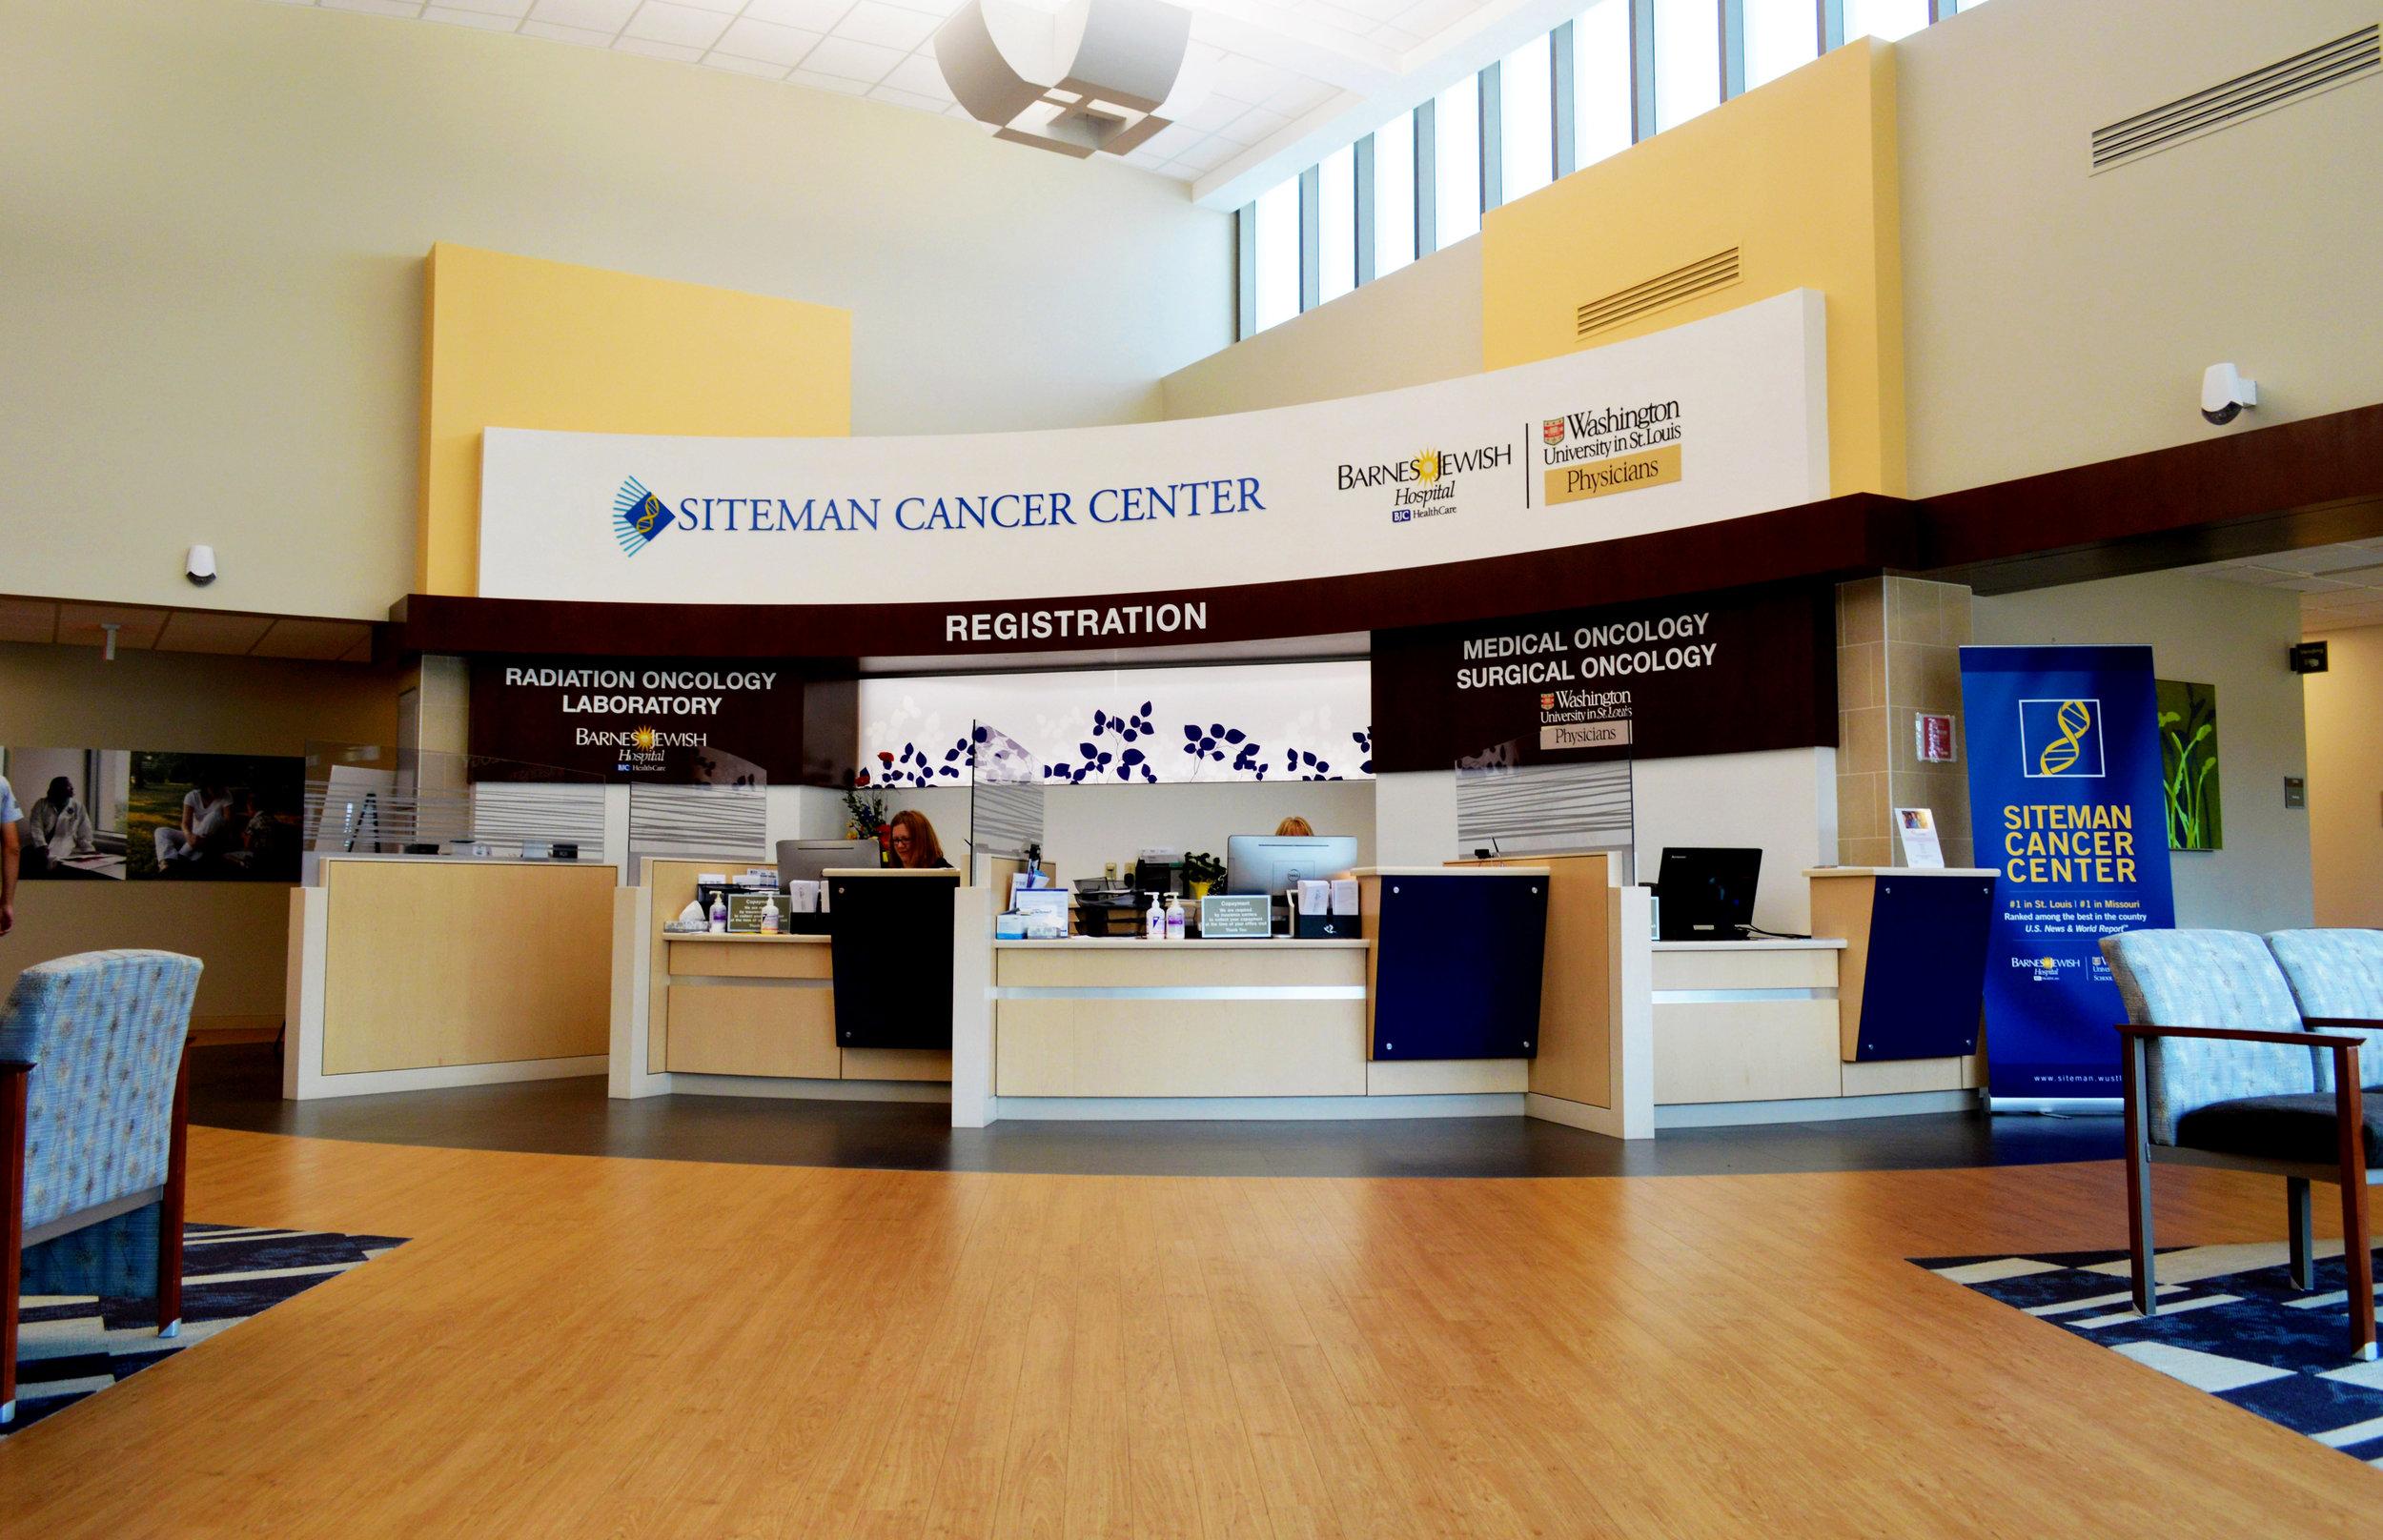 Siteman_Cancer_Center (2).JPG